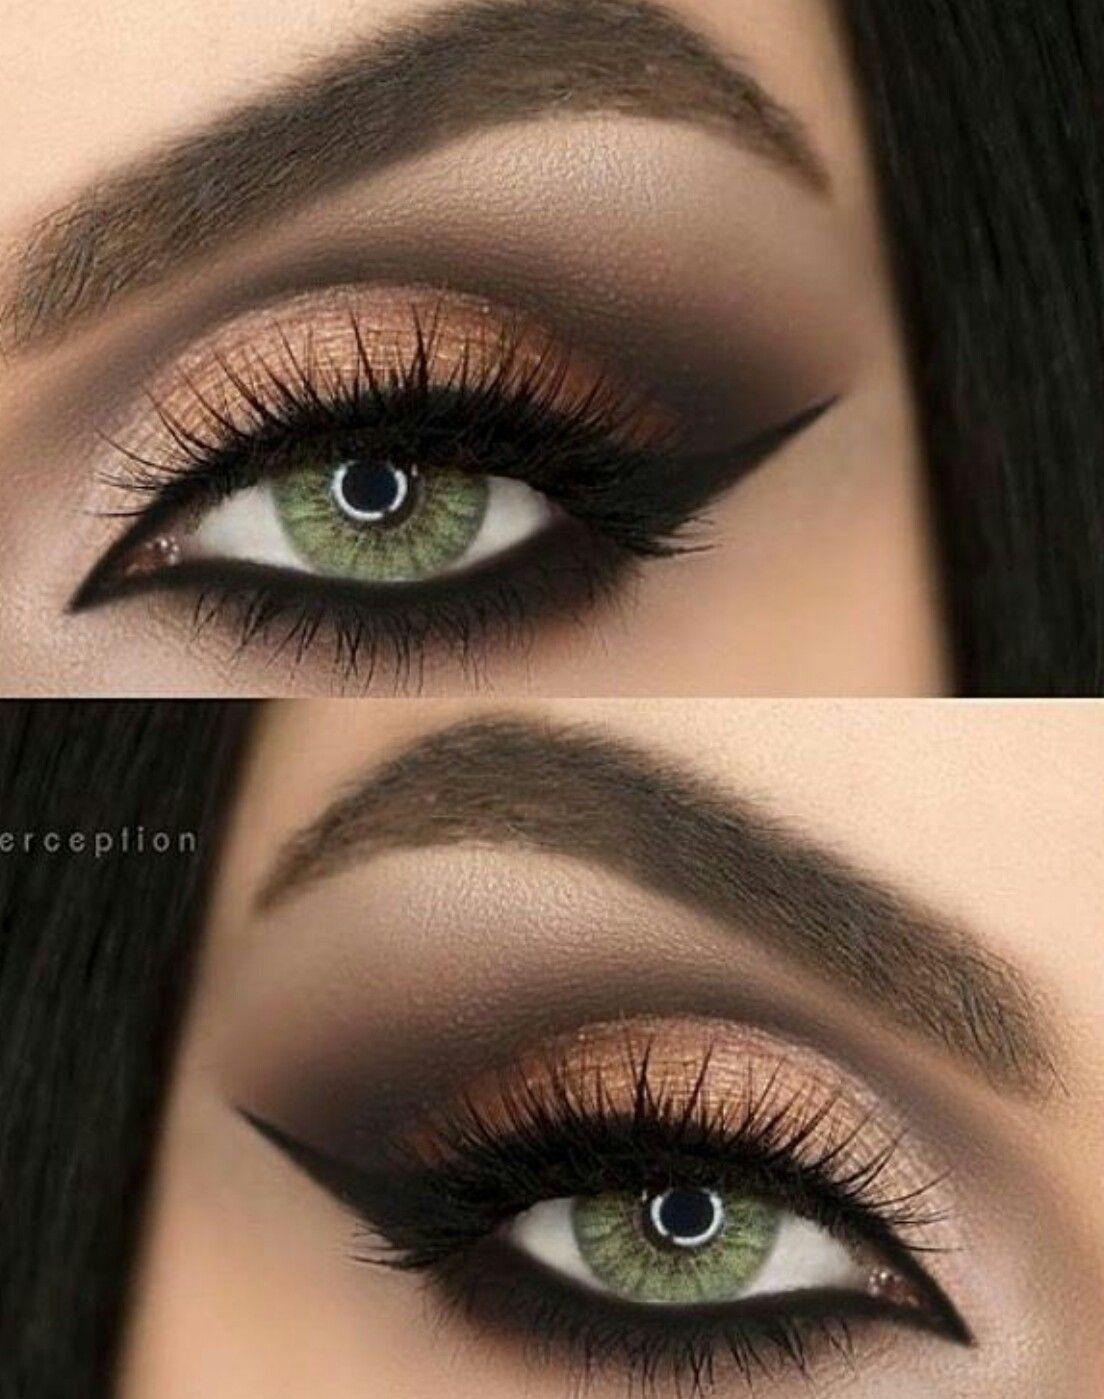 Best Colour For Green Eyes | Almond Eye Makeup, Green Makeup inside What Color Eye Makeup For Green Eyes